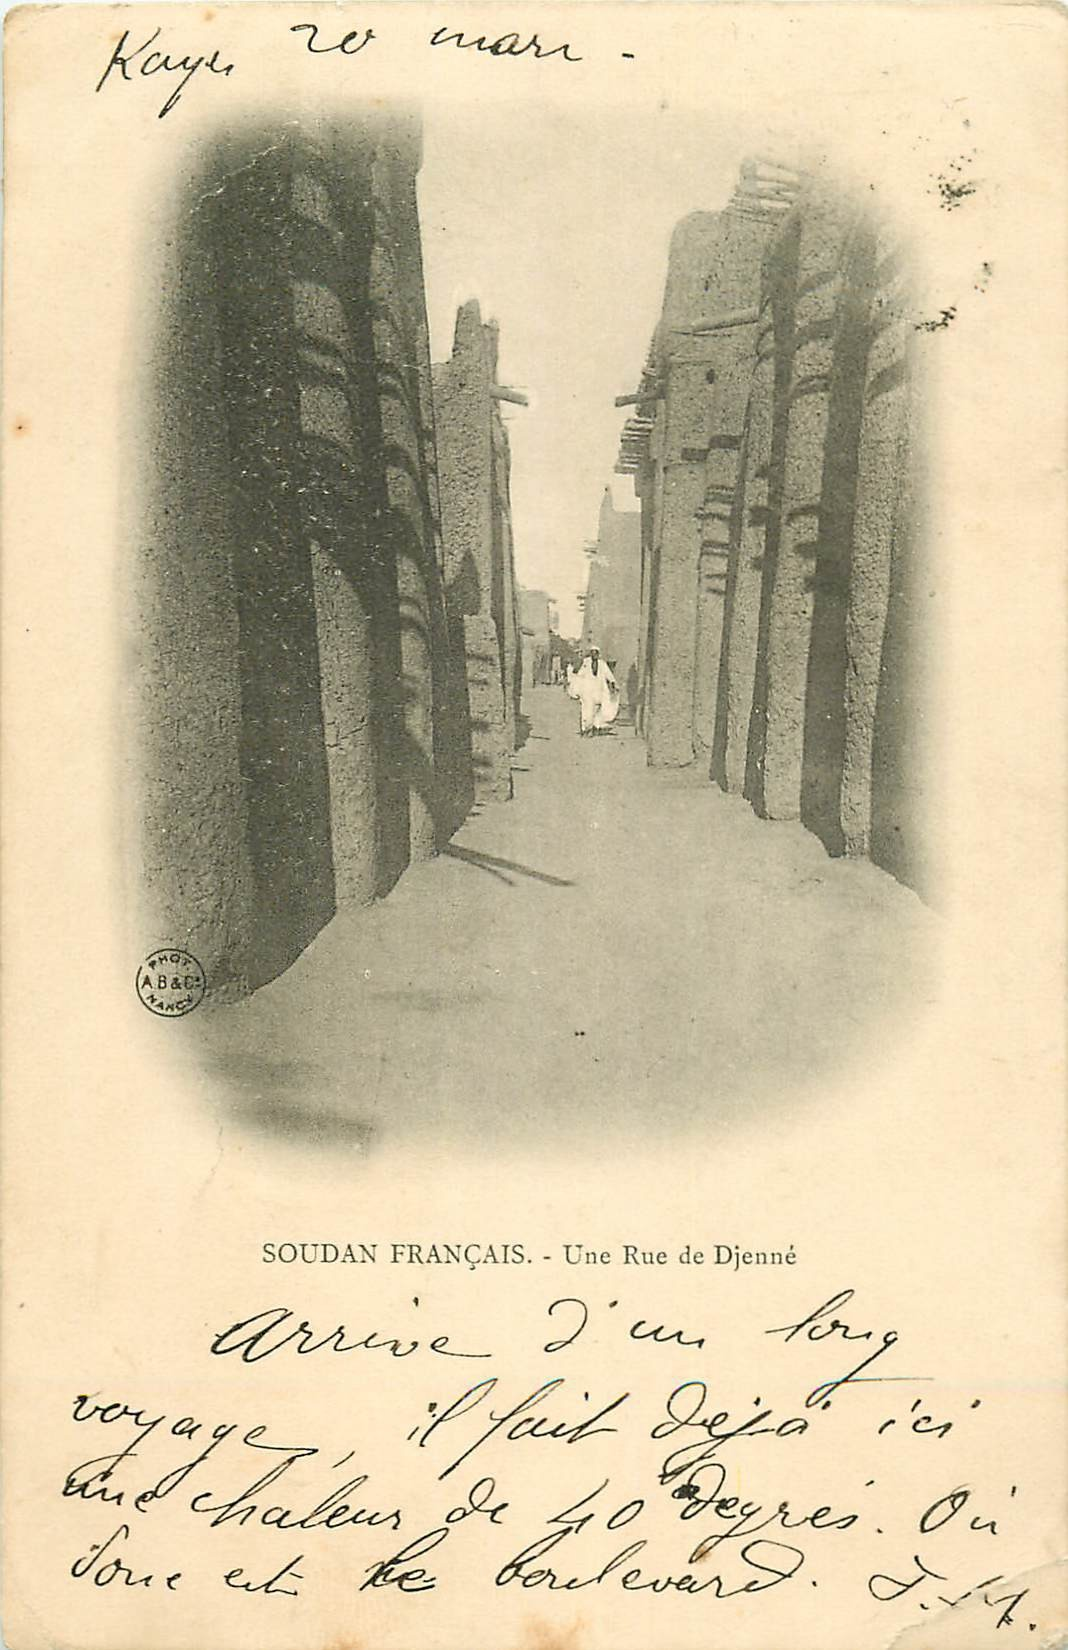 WW SOUDAN MALI. Rue djenné vers 1900